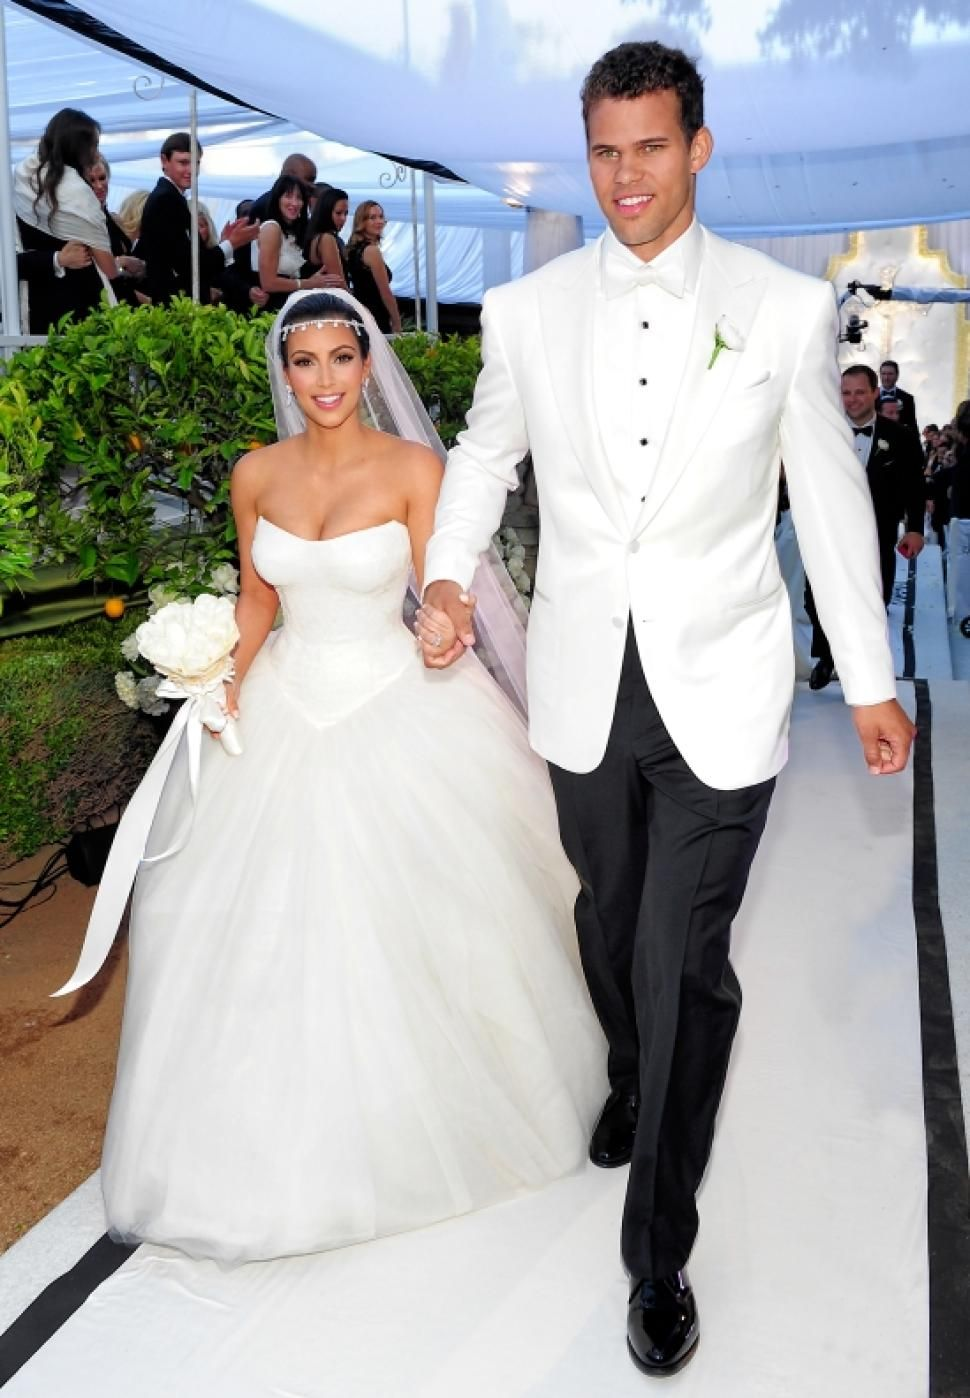 Kim Kardashian Wedding Photos Kim Kardashian Wedding Dress Photo Kim Kardashian Wedding Kardashian Wedding Mermaid Bridesmaid Dresses